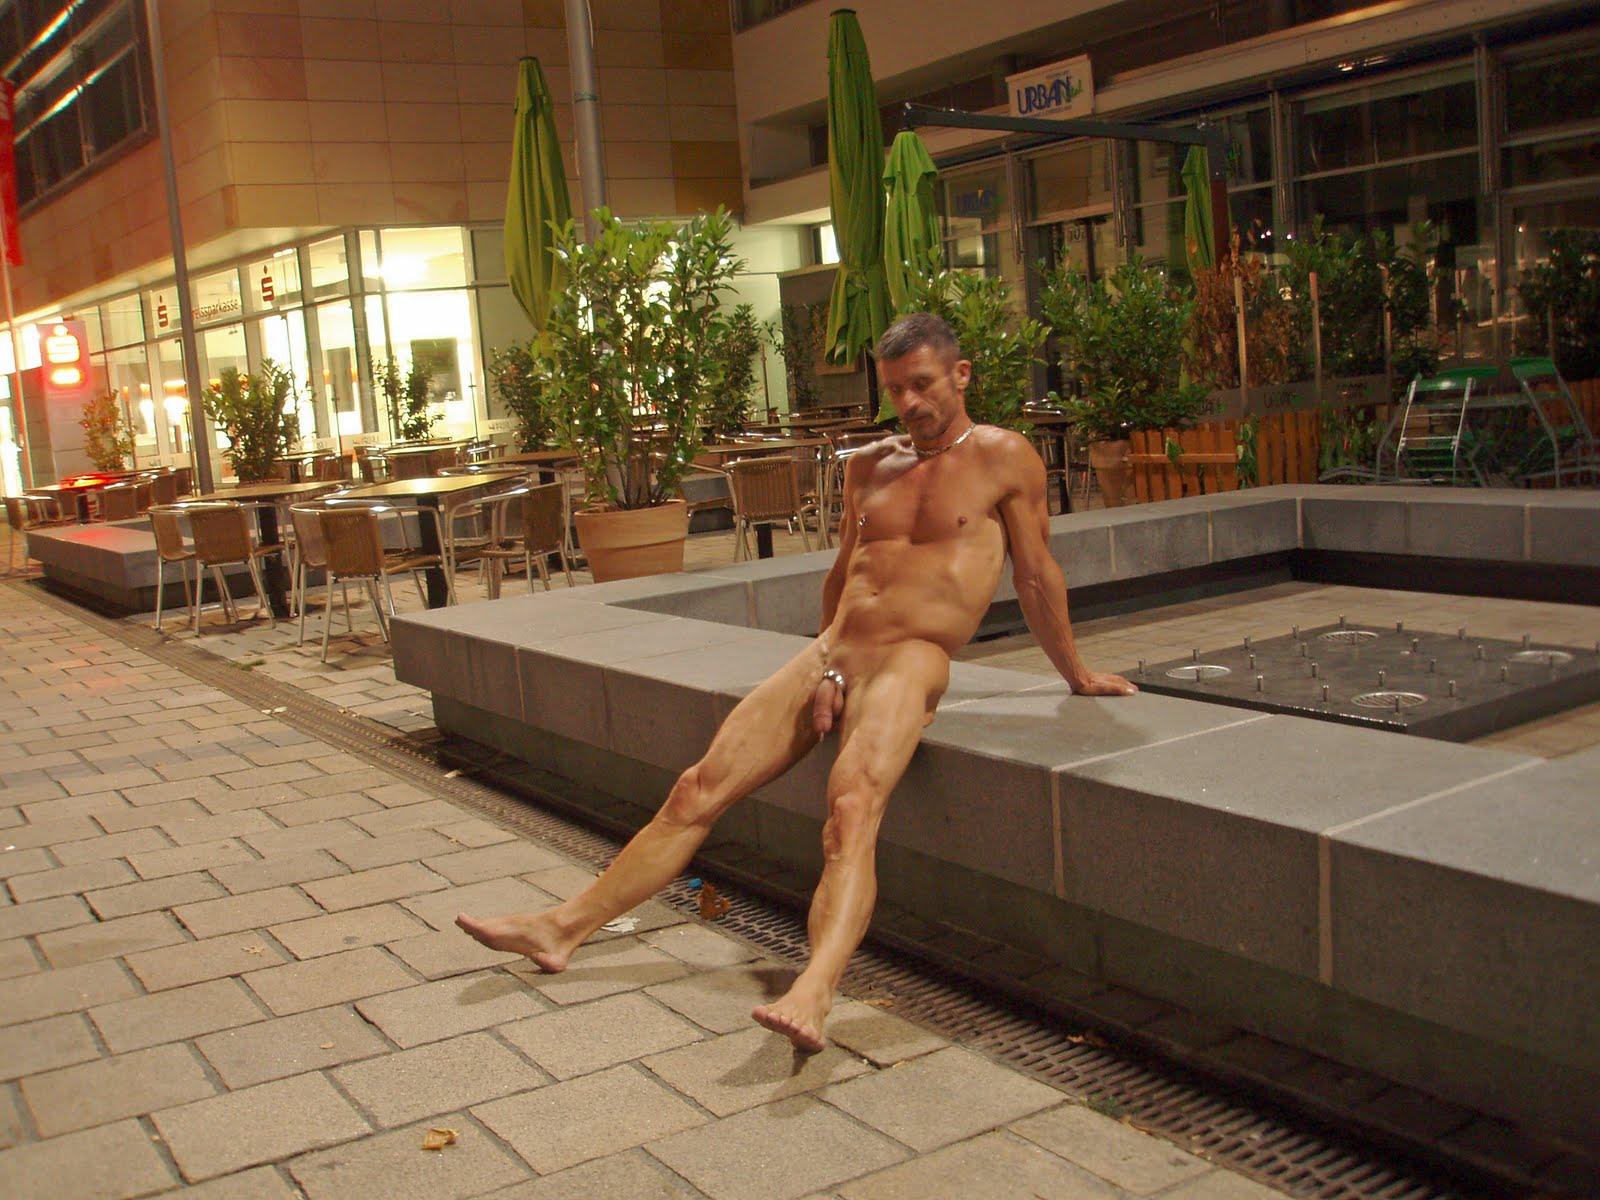 Gay Exhibitionist